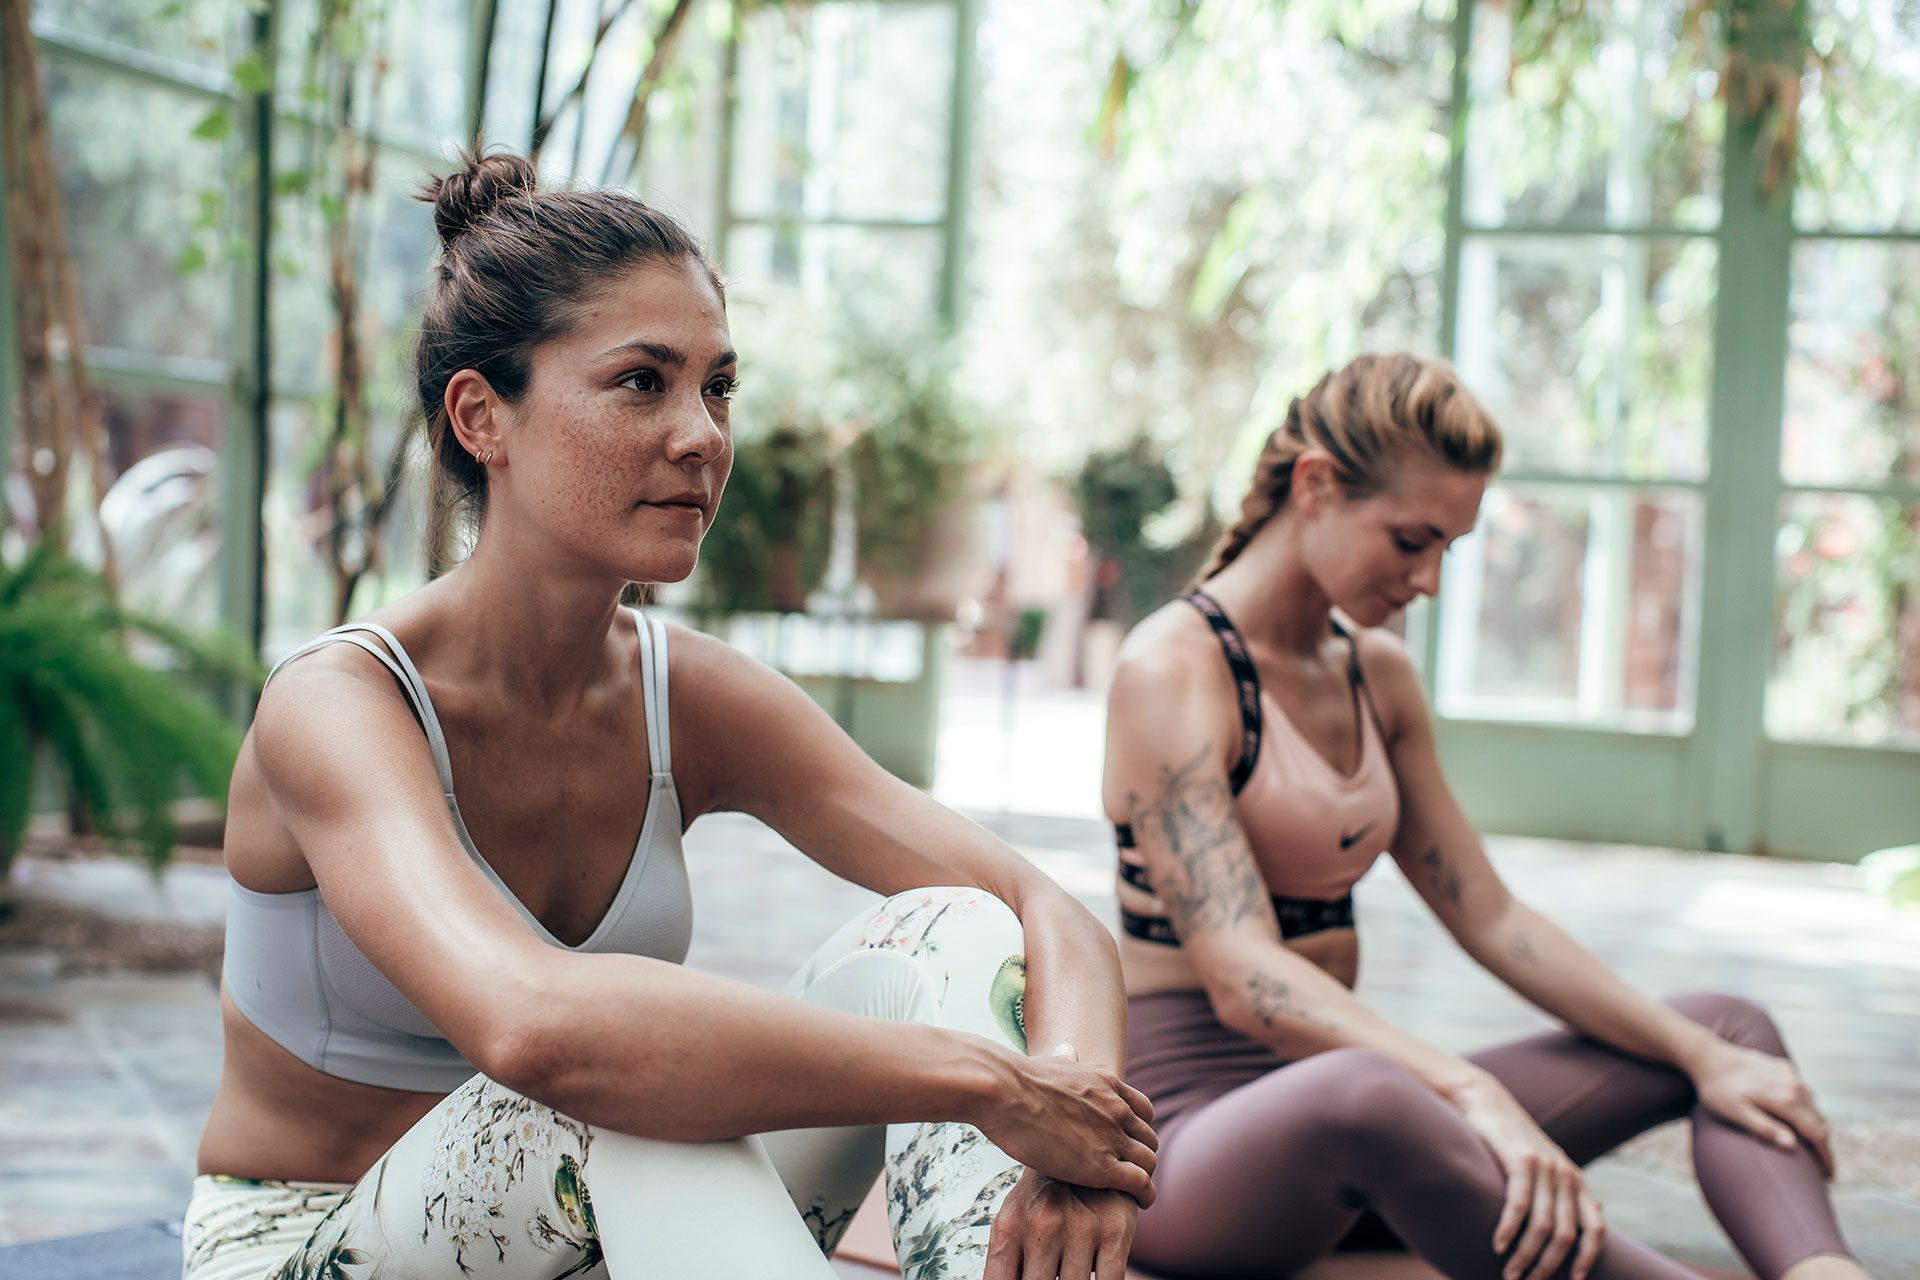 Engelhorn Sportbekleidung Fitness Yoga Meditation Frauen Fotograf London